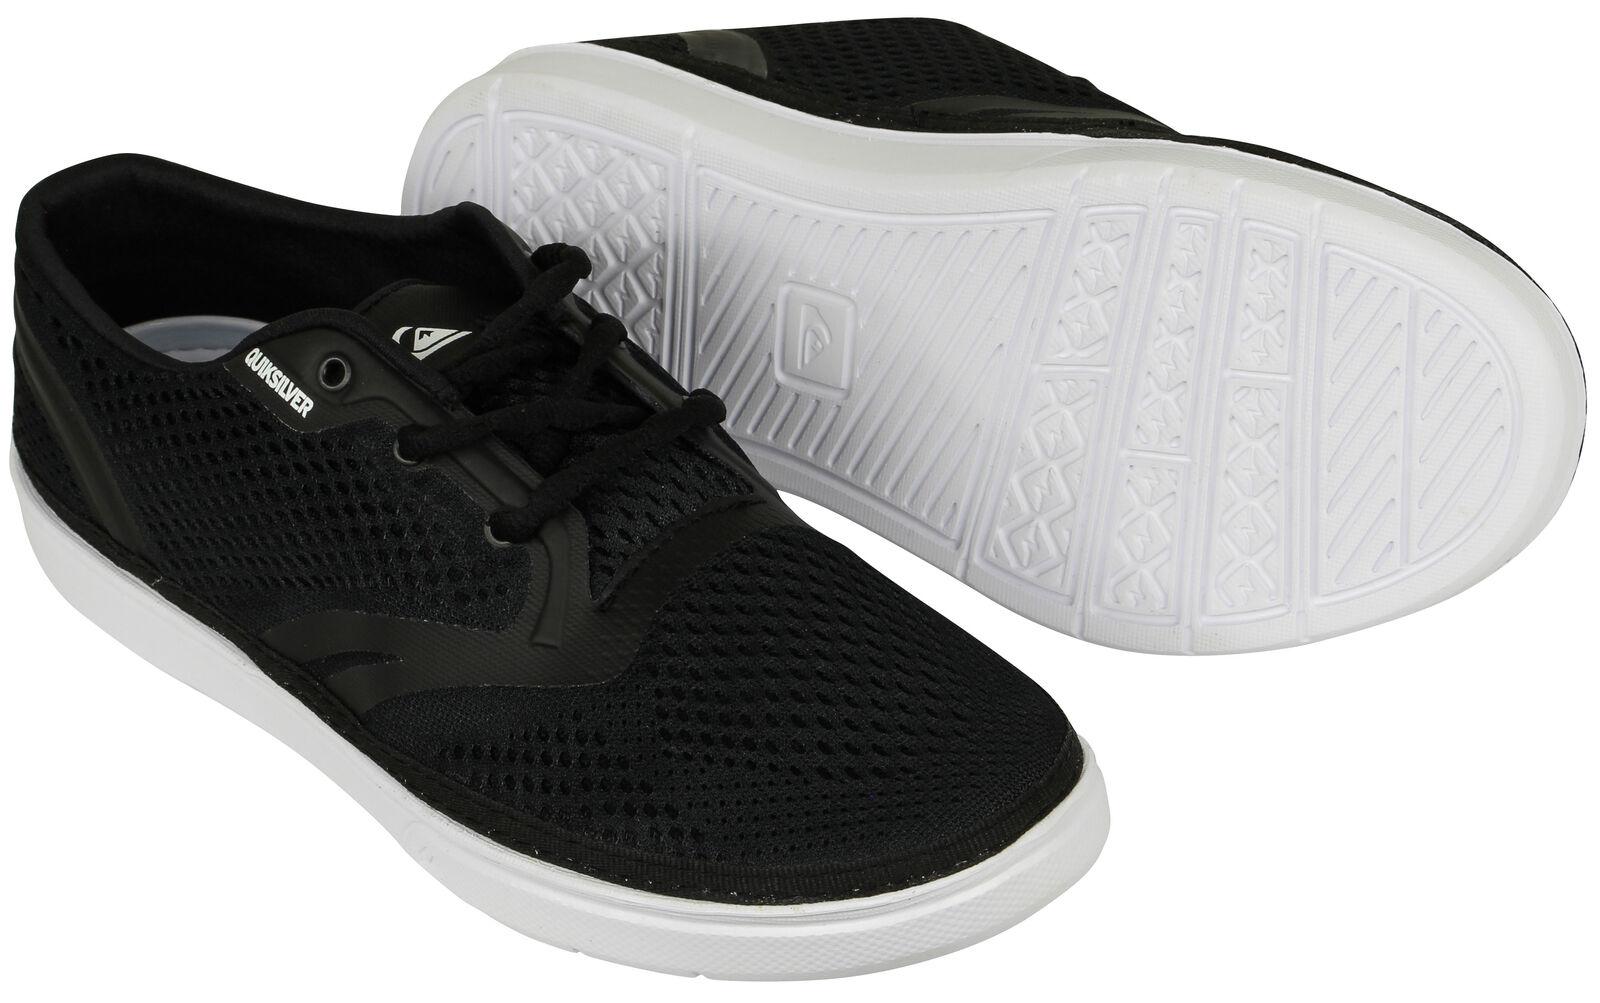 Quiksilver Mens Oceanside shoes - Black White